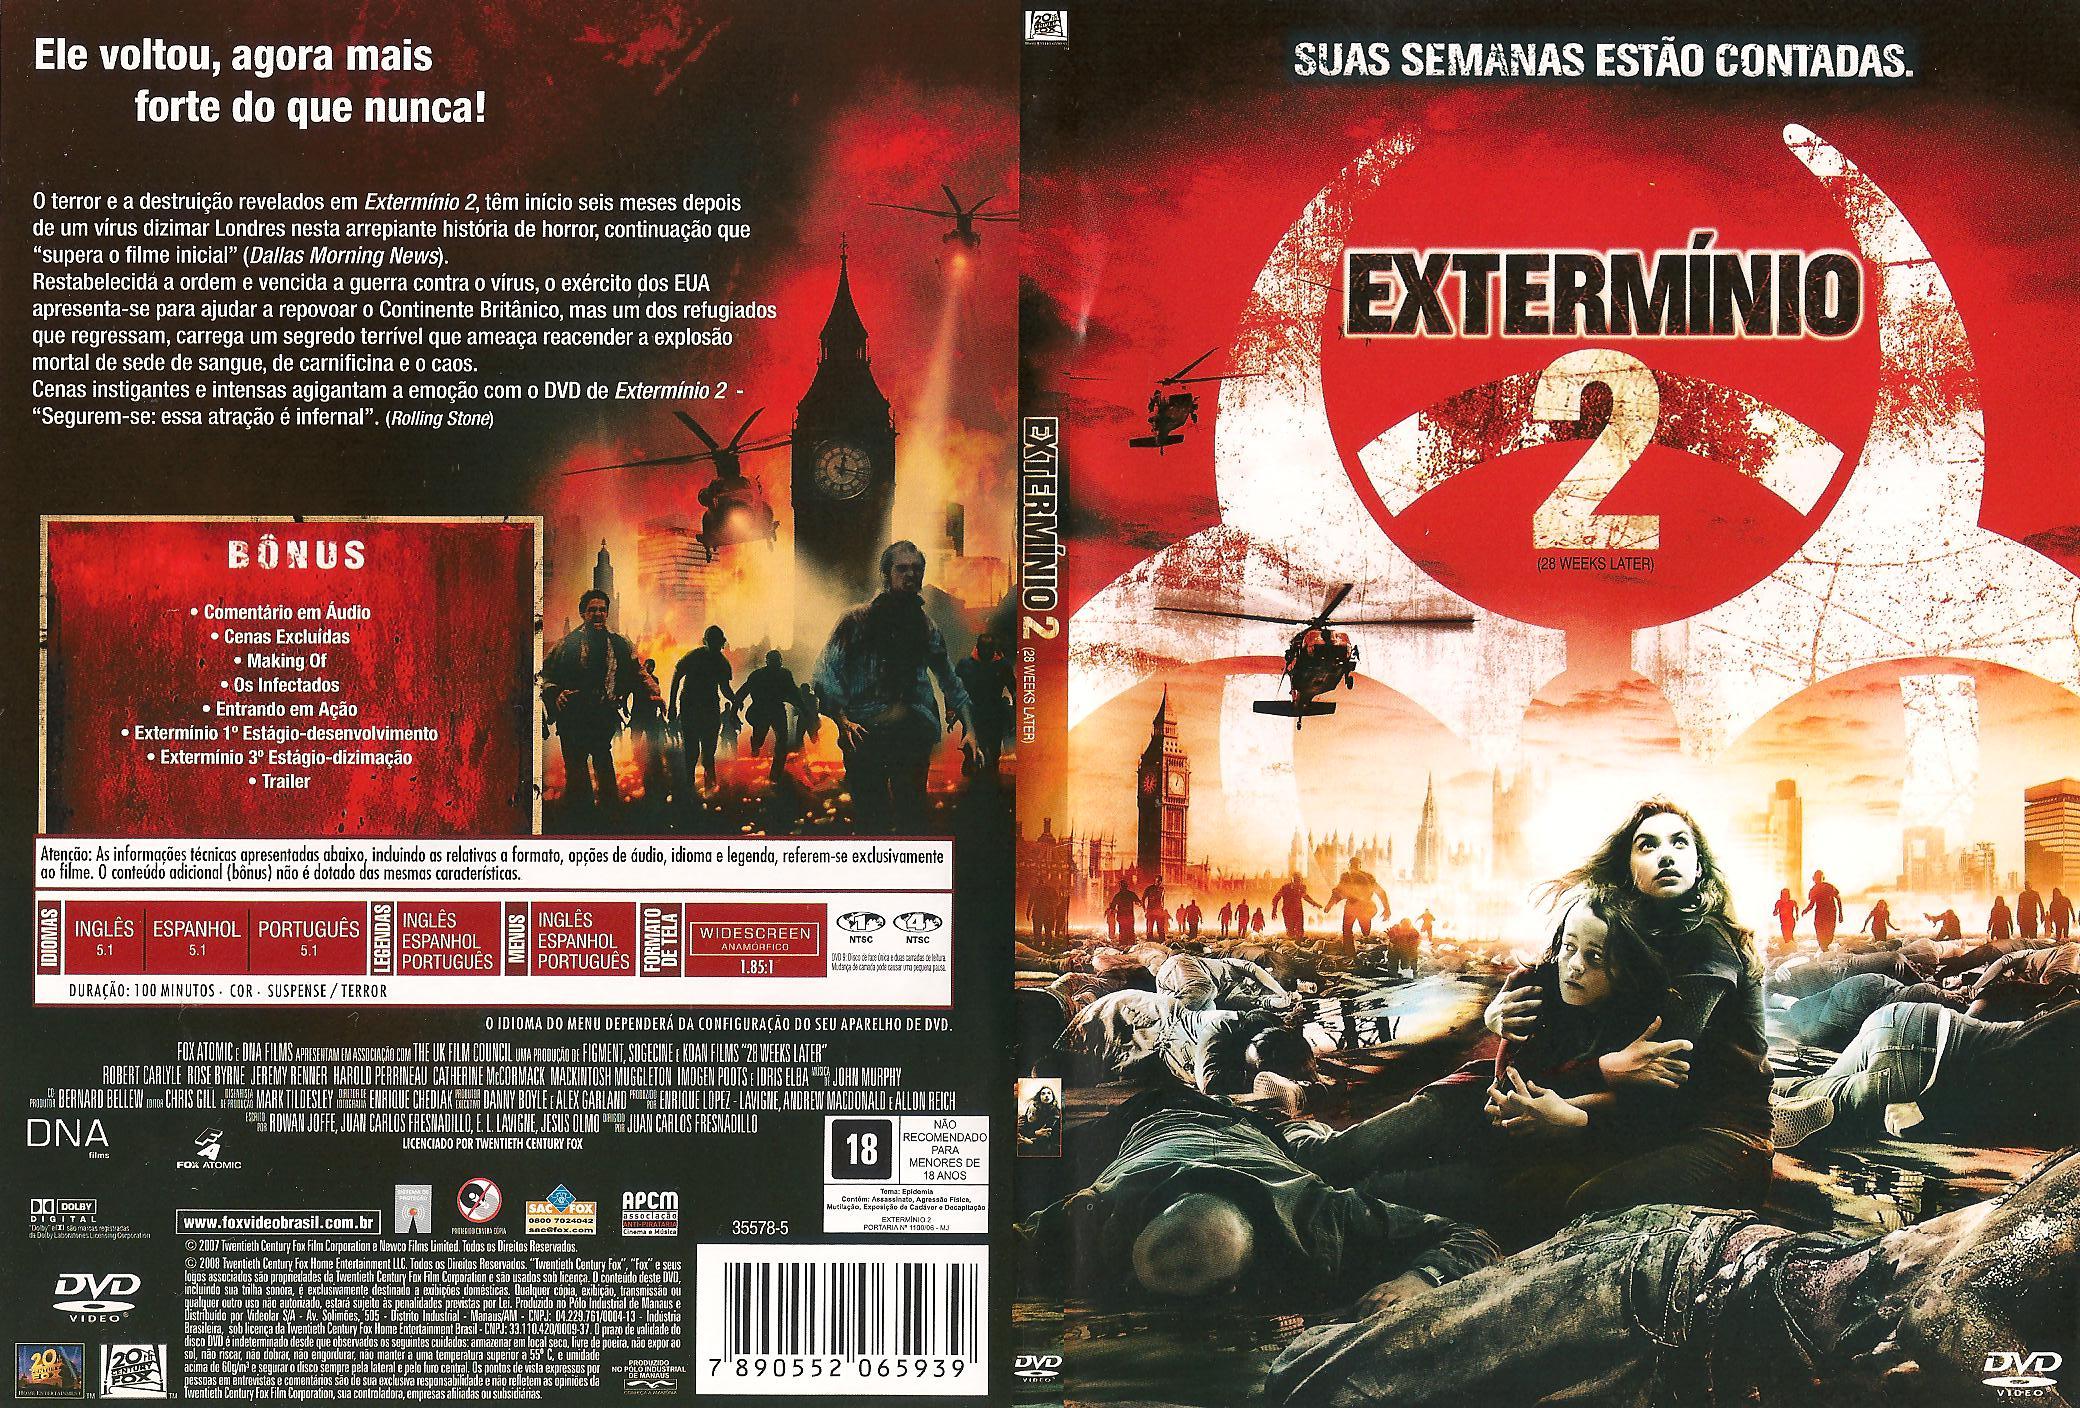 Exterminio2